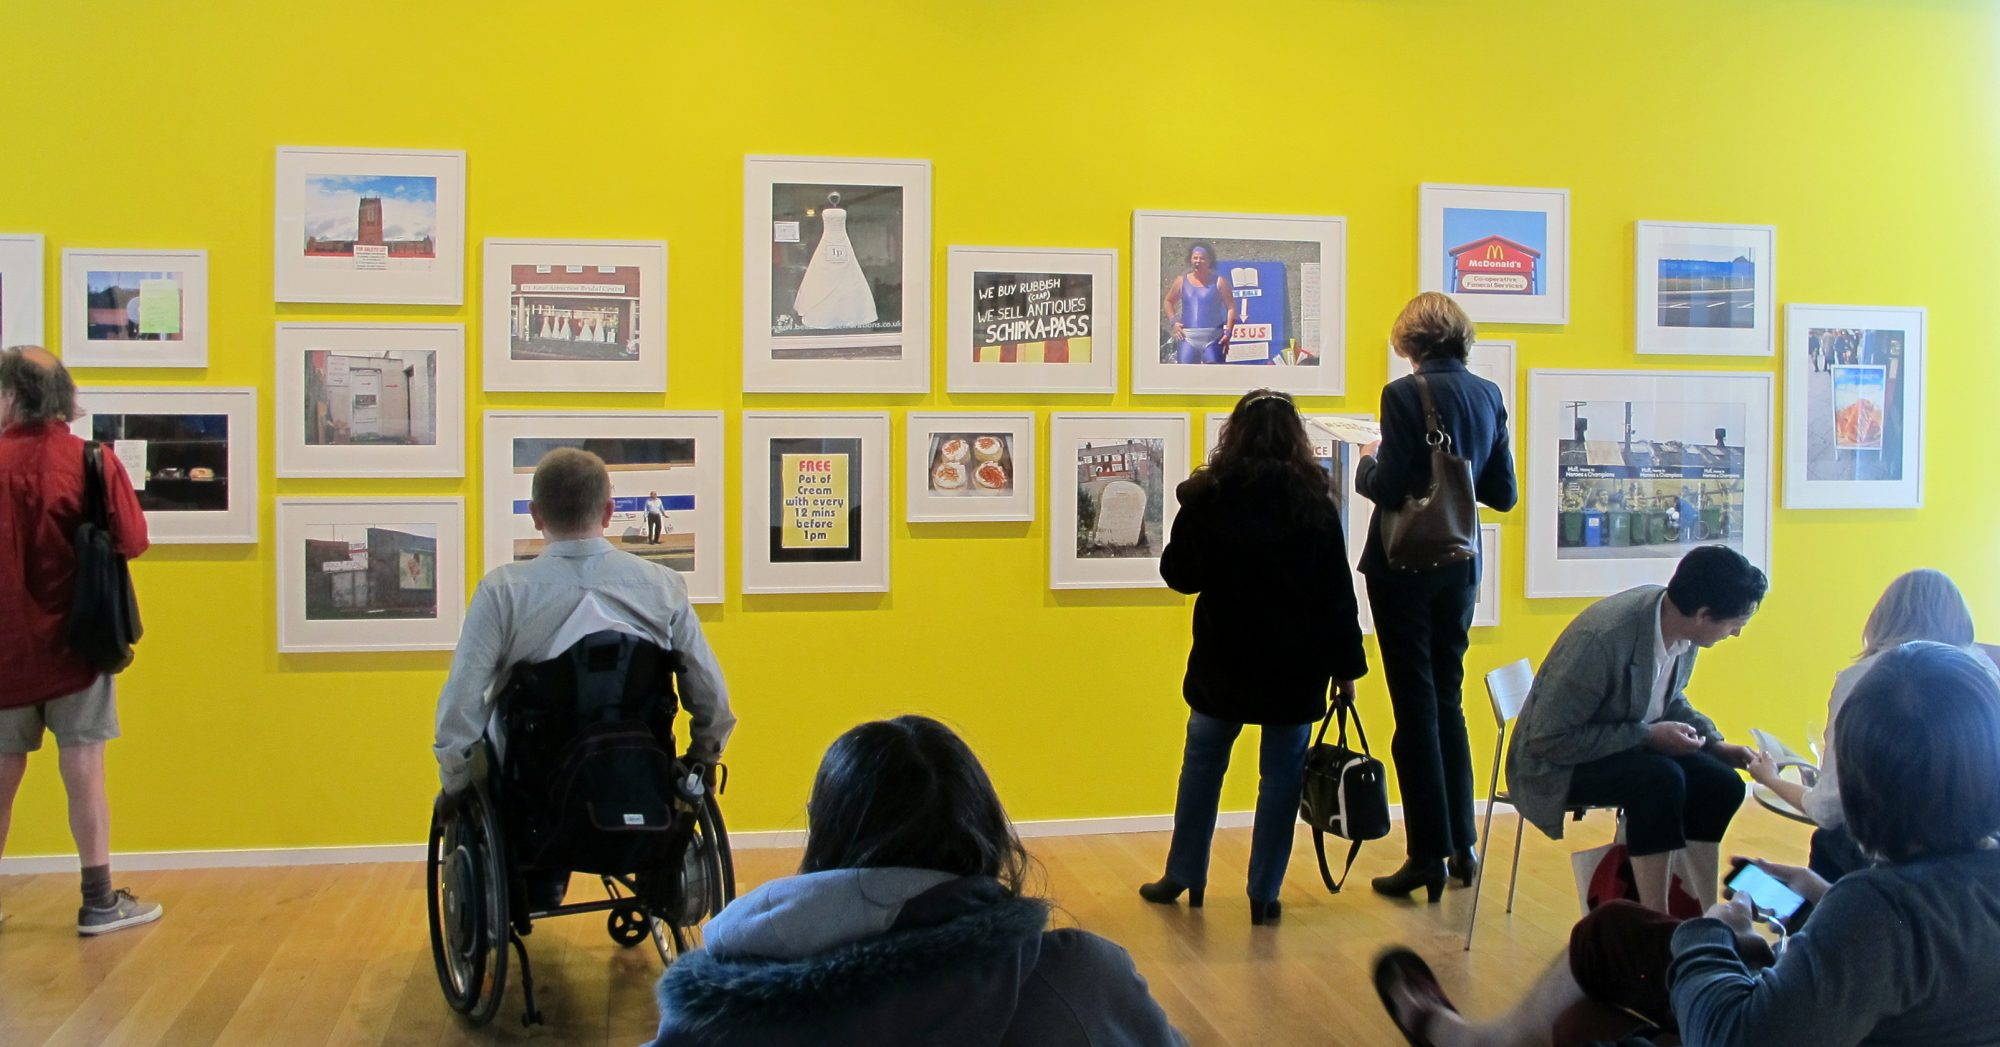 The Caravan Gallery installation at Impressiosn Gallery